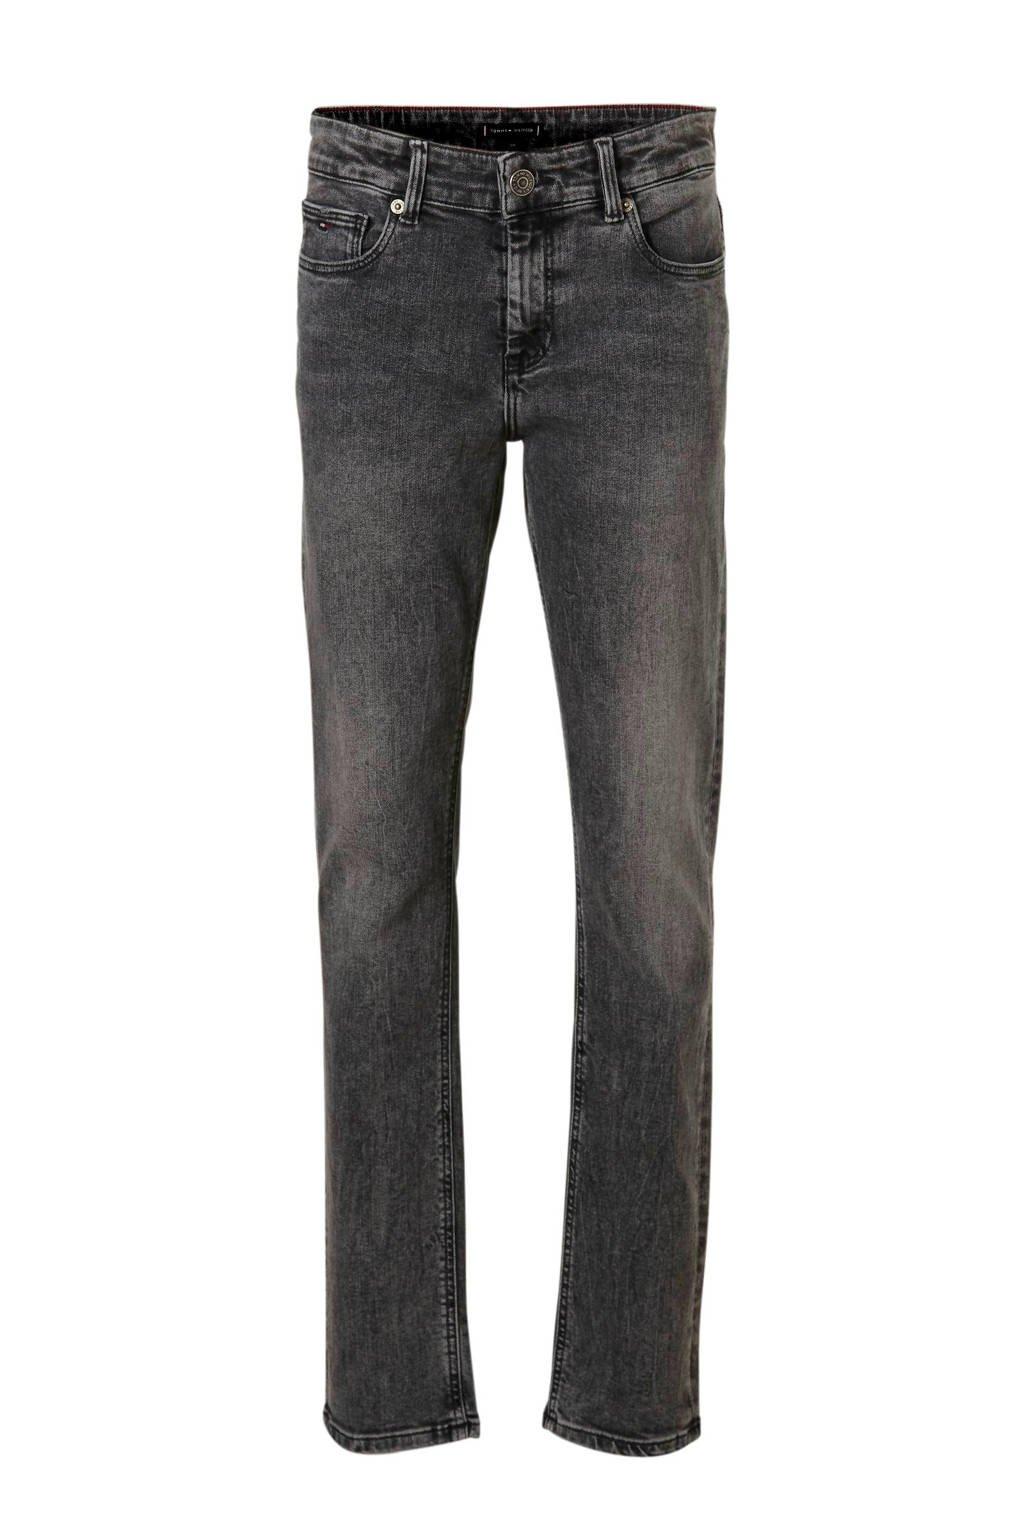 Tommy Hilfiger slim fit jeans Scanton grijs, Grijs